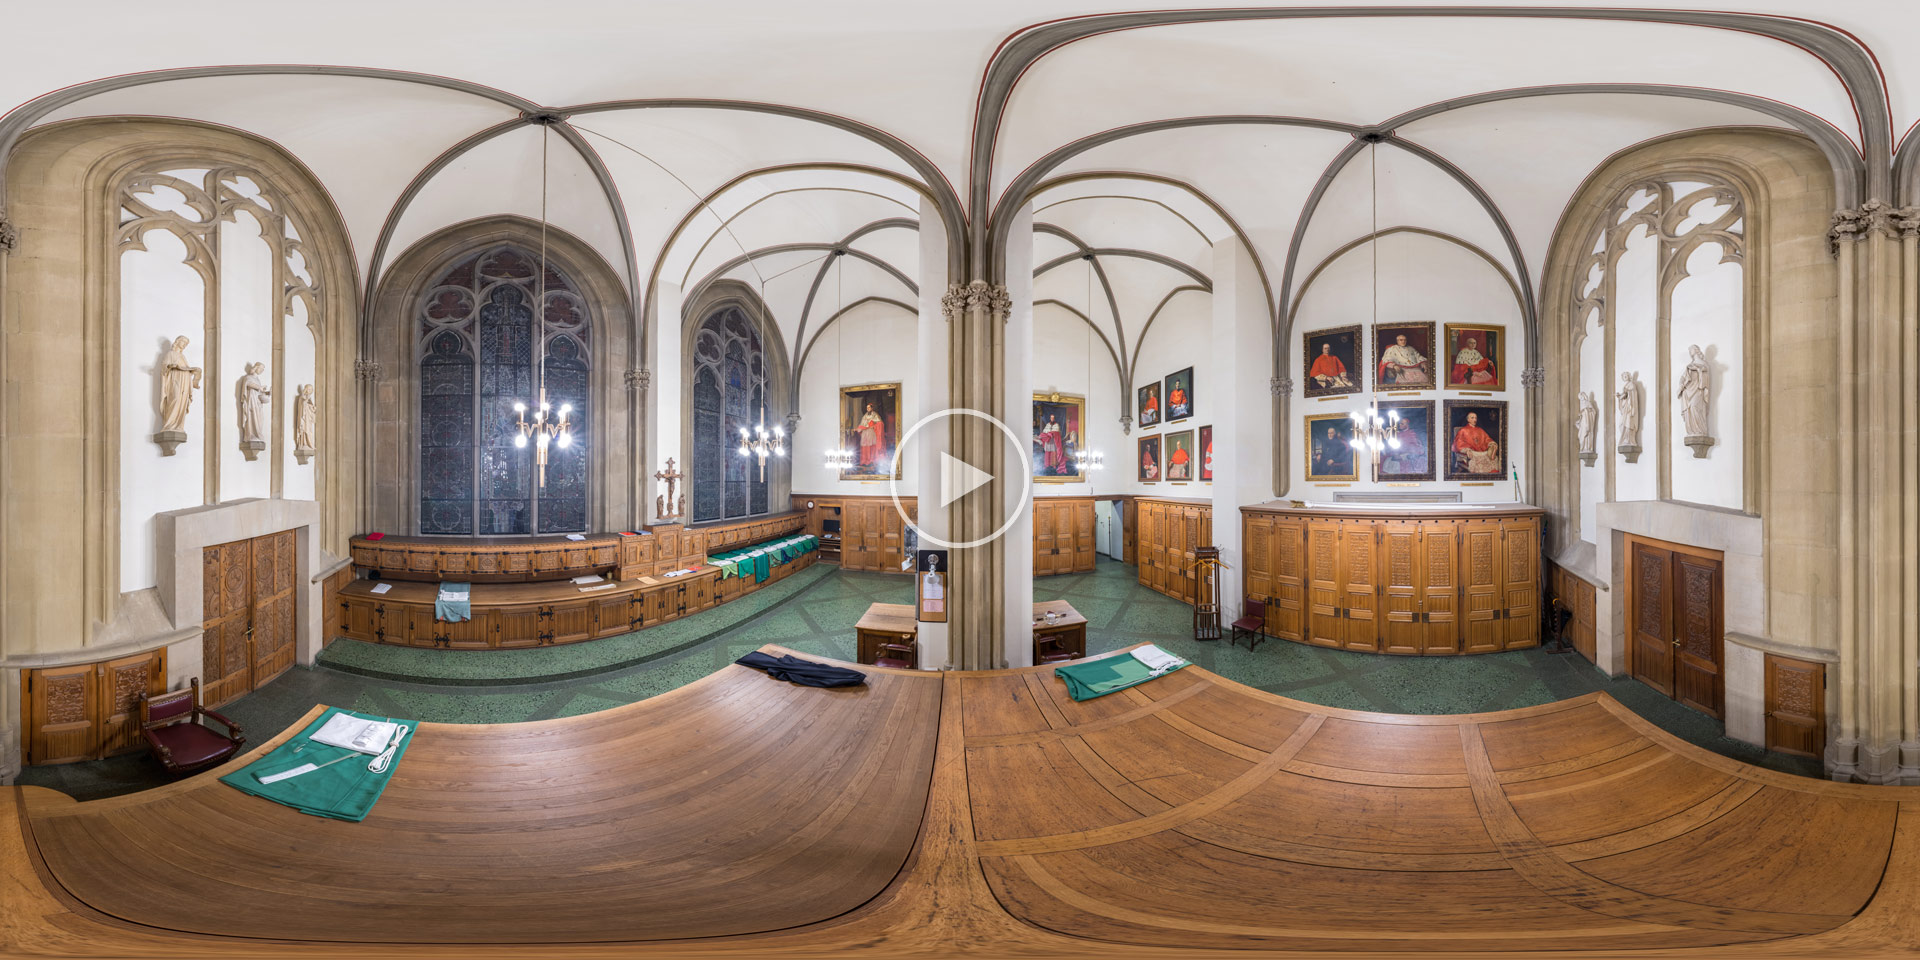 Sakristei im Kölner Dom – 360°x180° Panorama